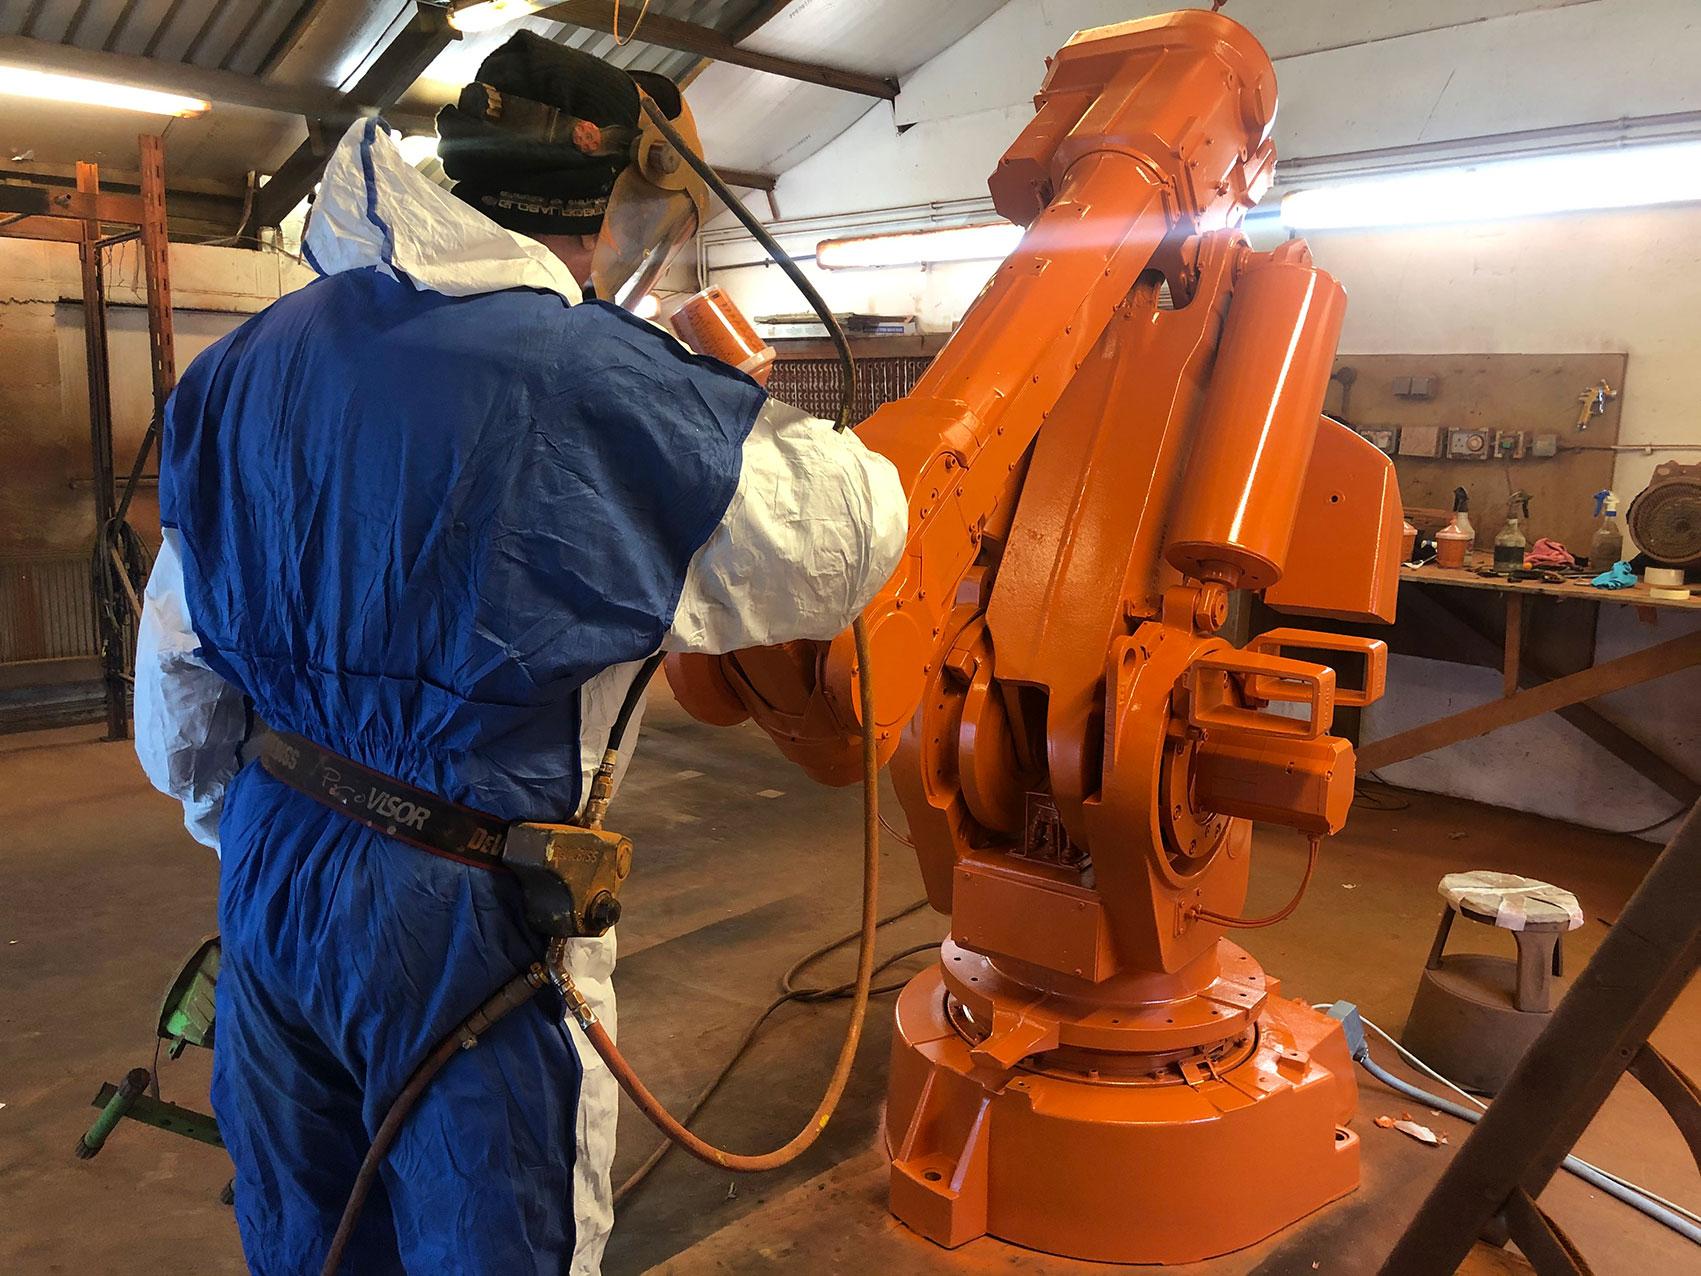 Spray painting robots